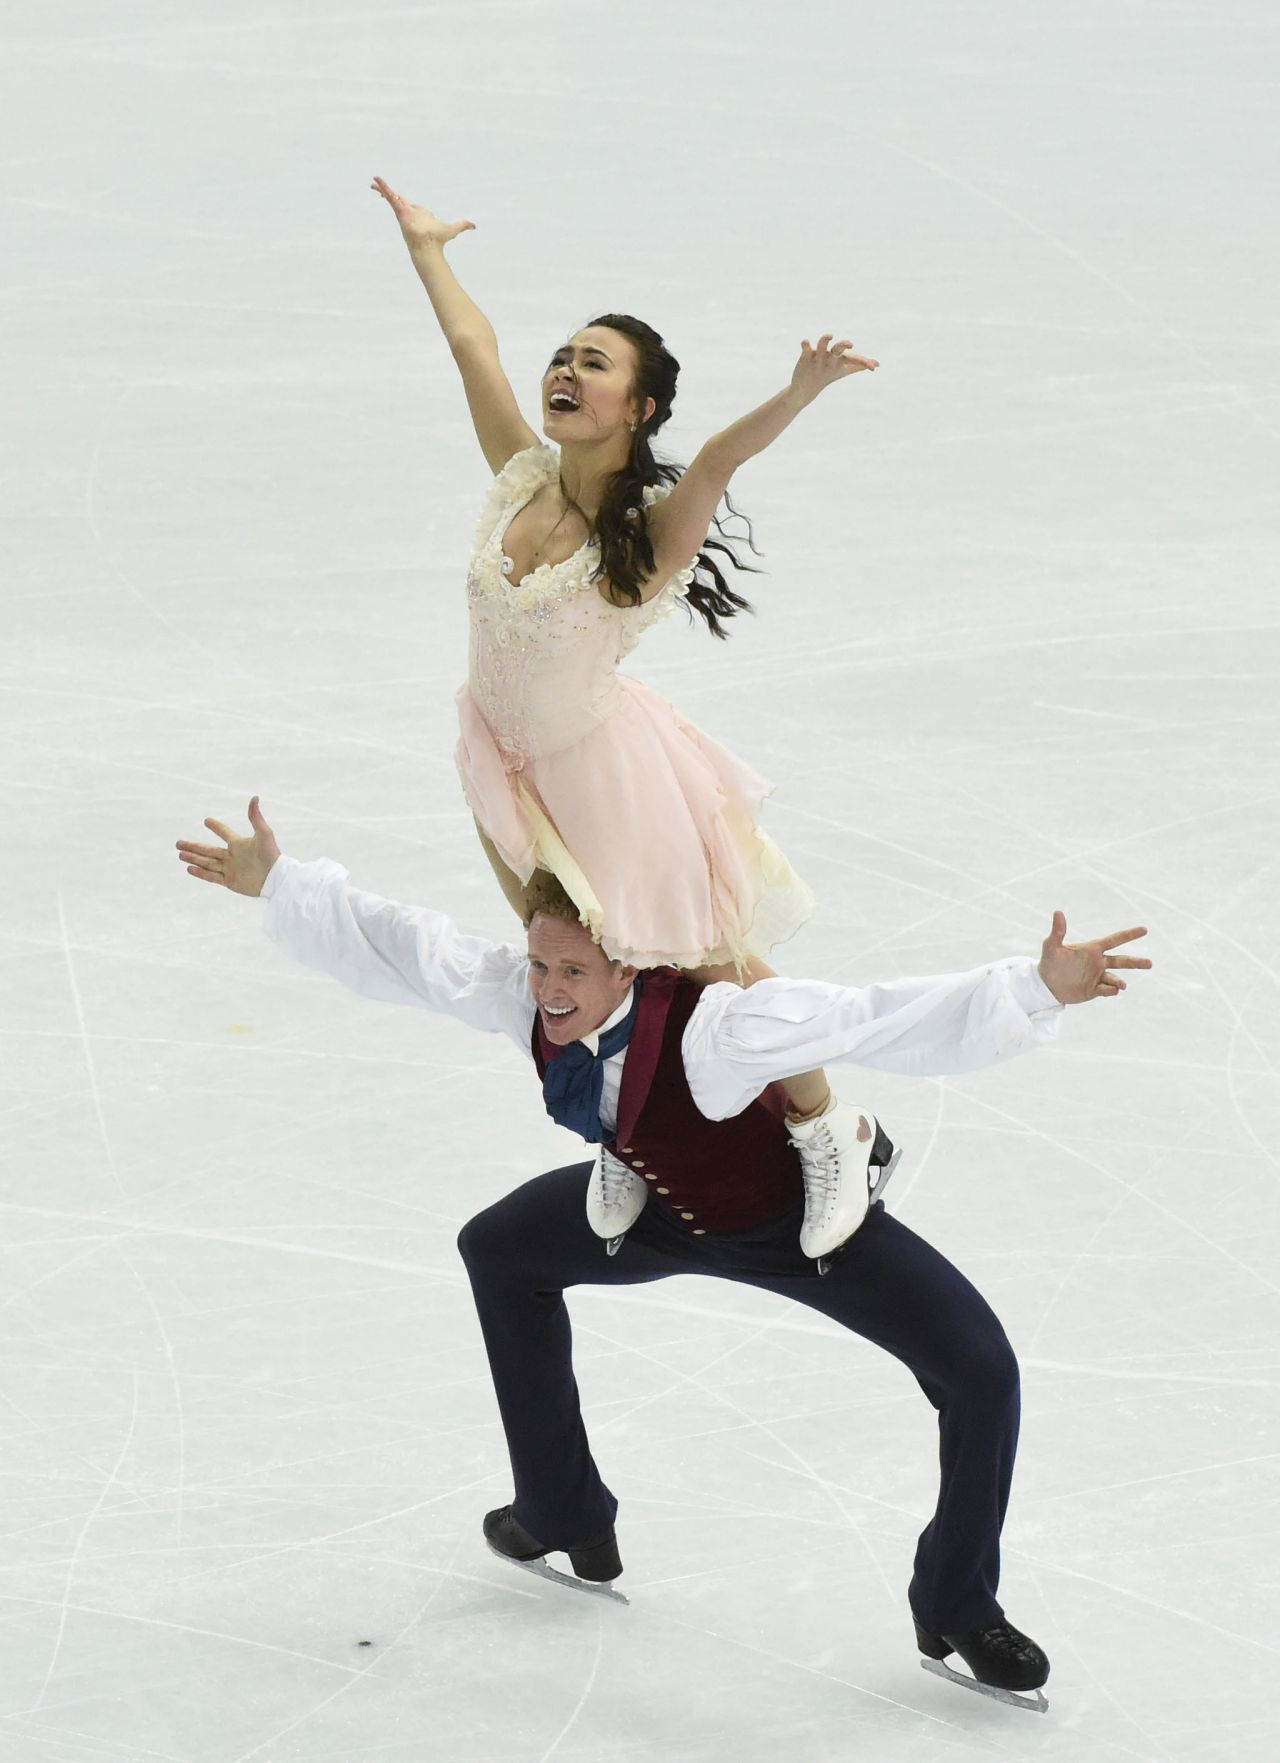 Madison Chock 2014 Sochi Winter Olympics Figure